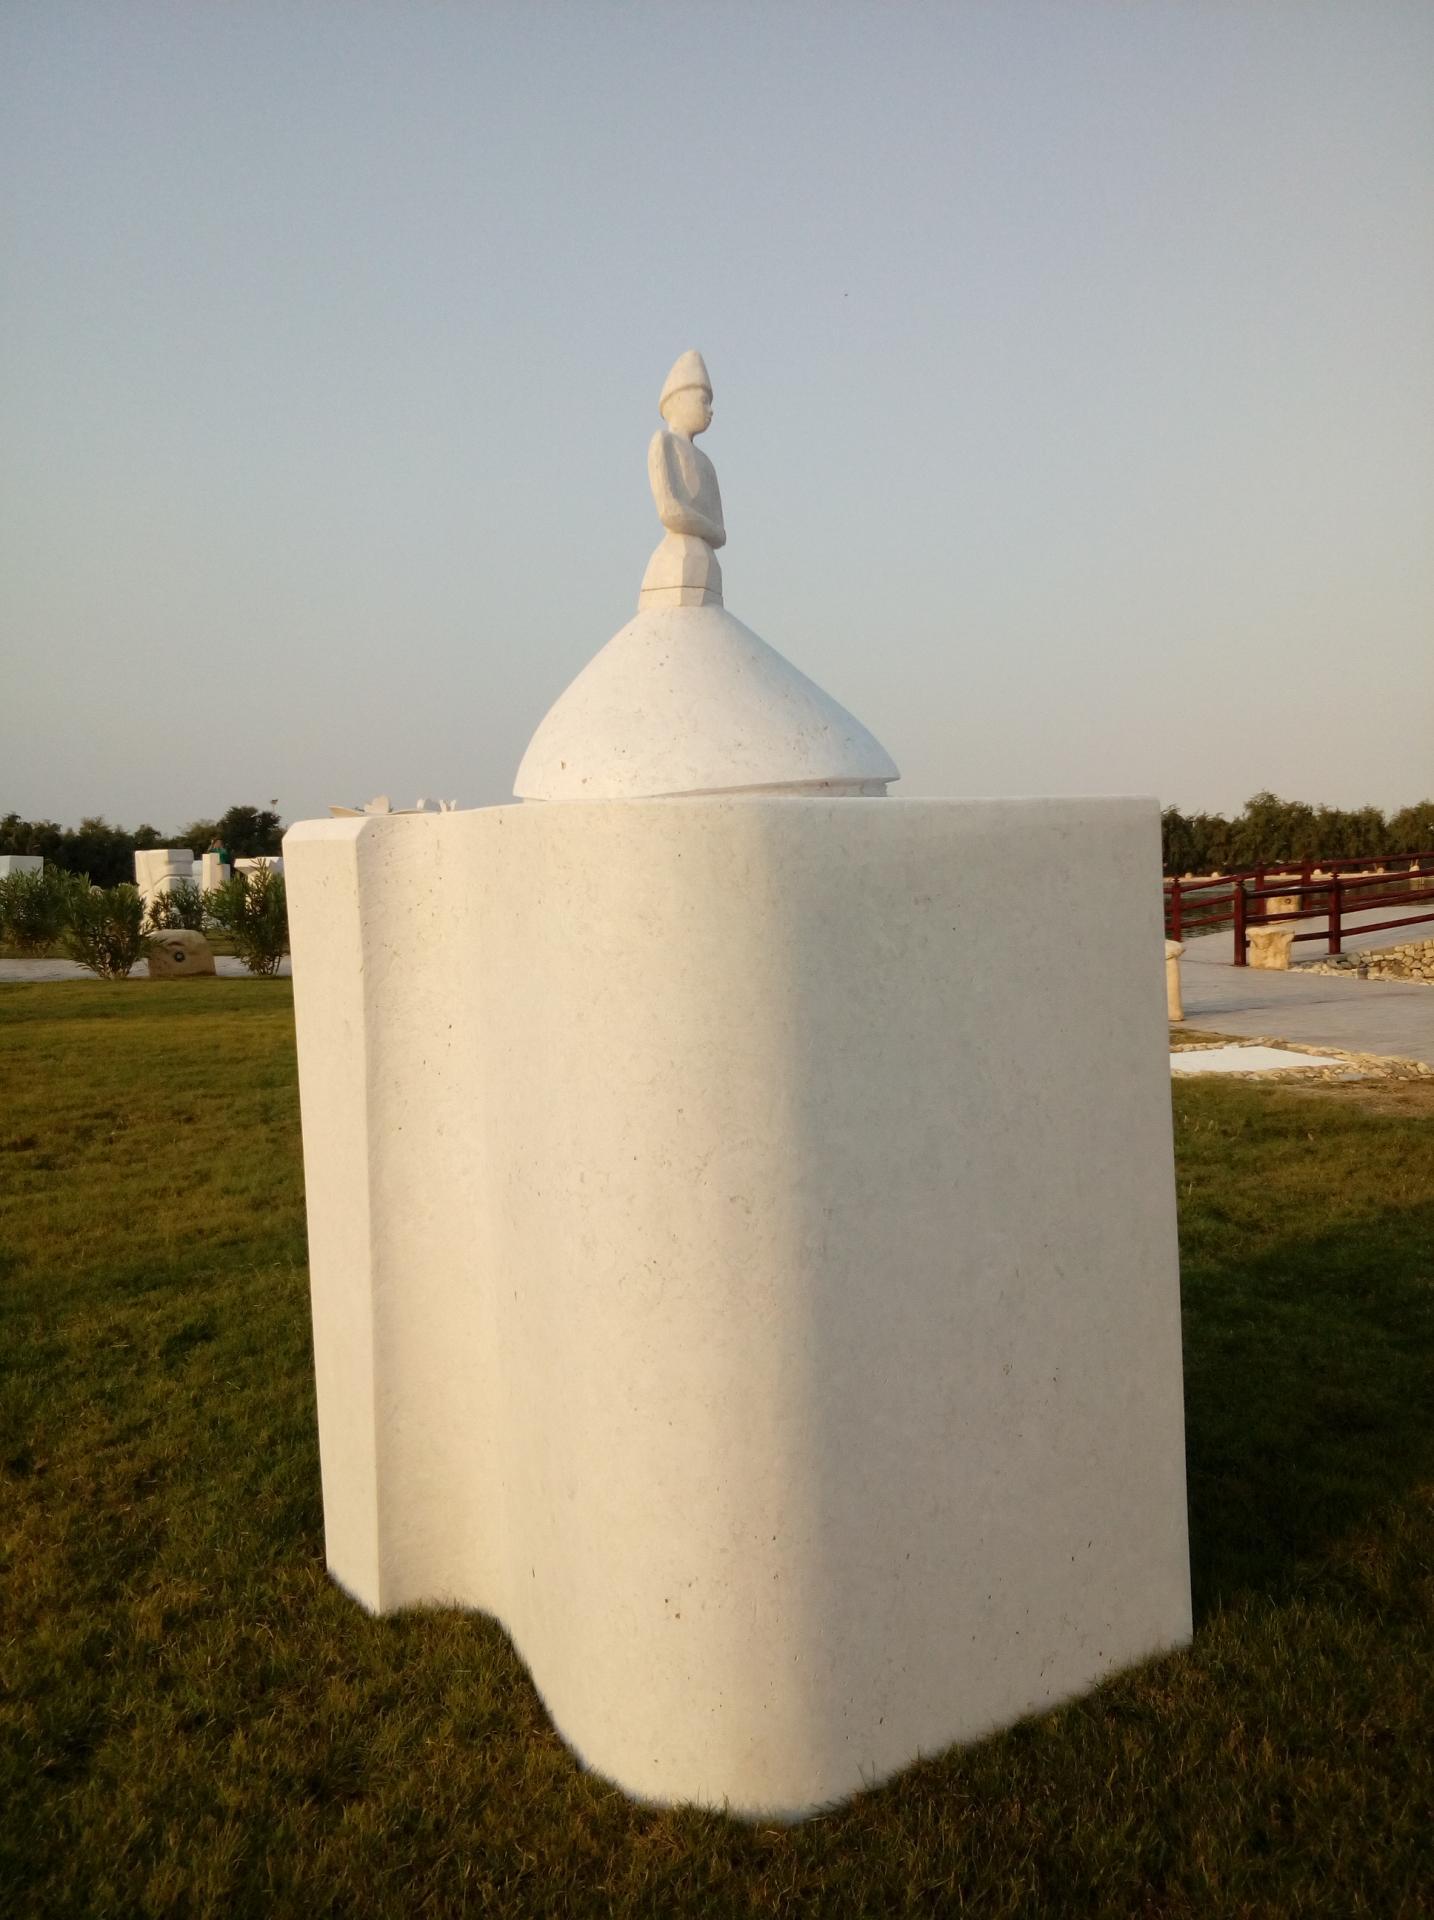 Sufi dynamo, marbre d' Oman et Emeraude, 170x90x90cm